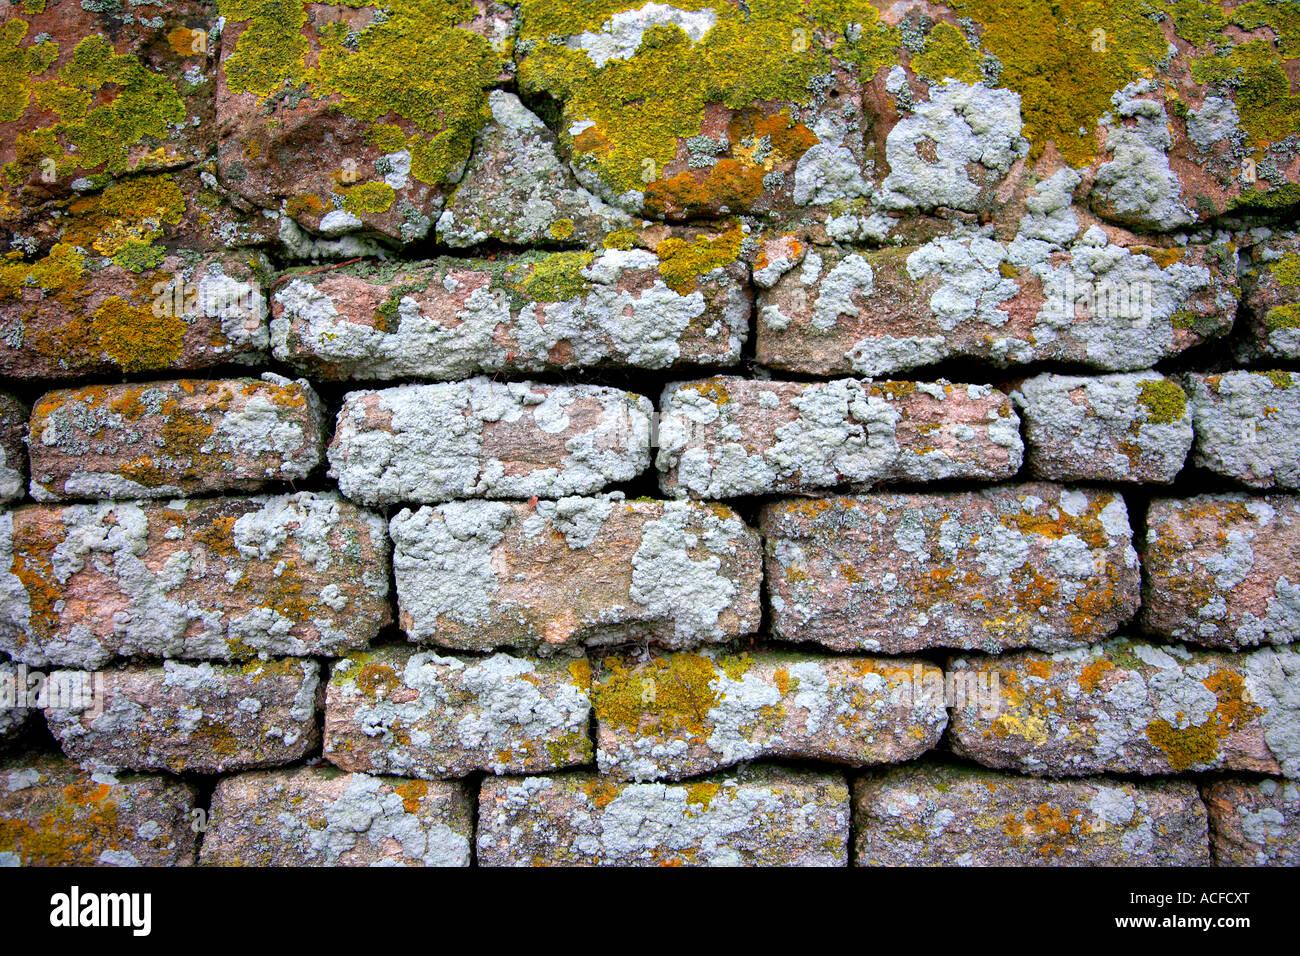 Detalle de pared DryStone Liquen patens textura ladrillos Imagen De Stock